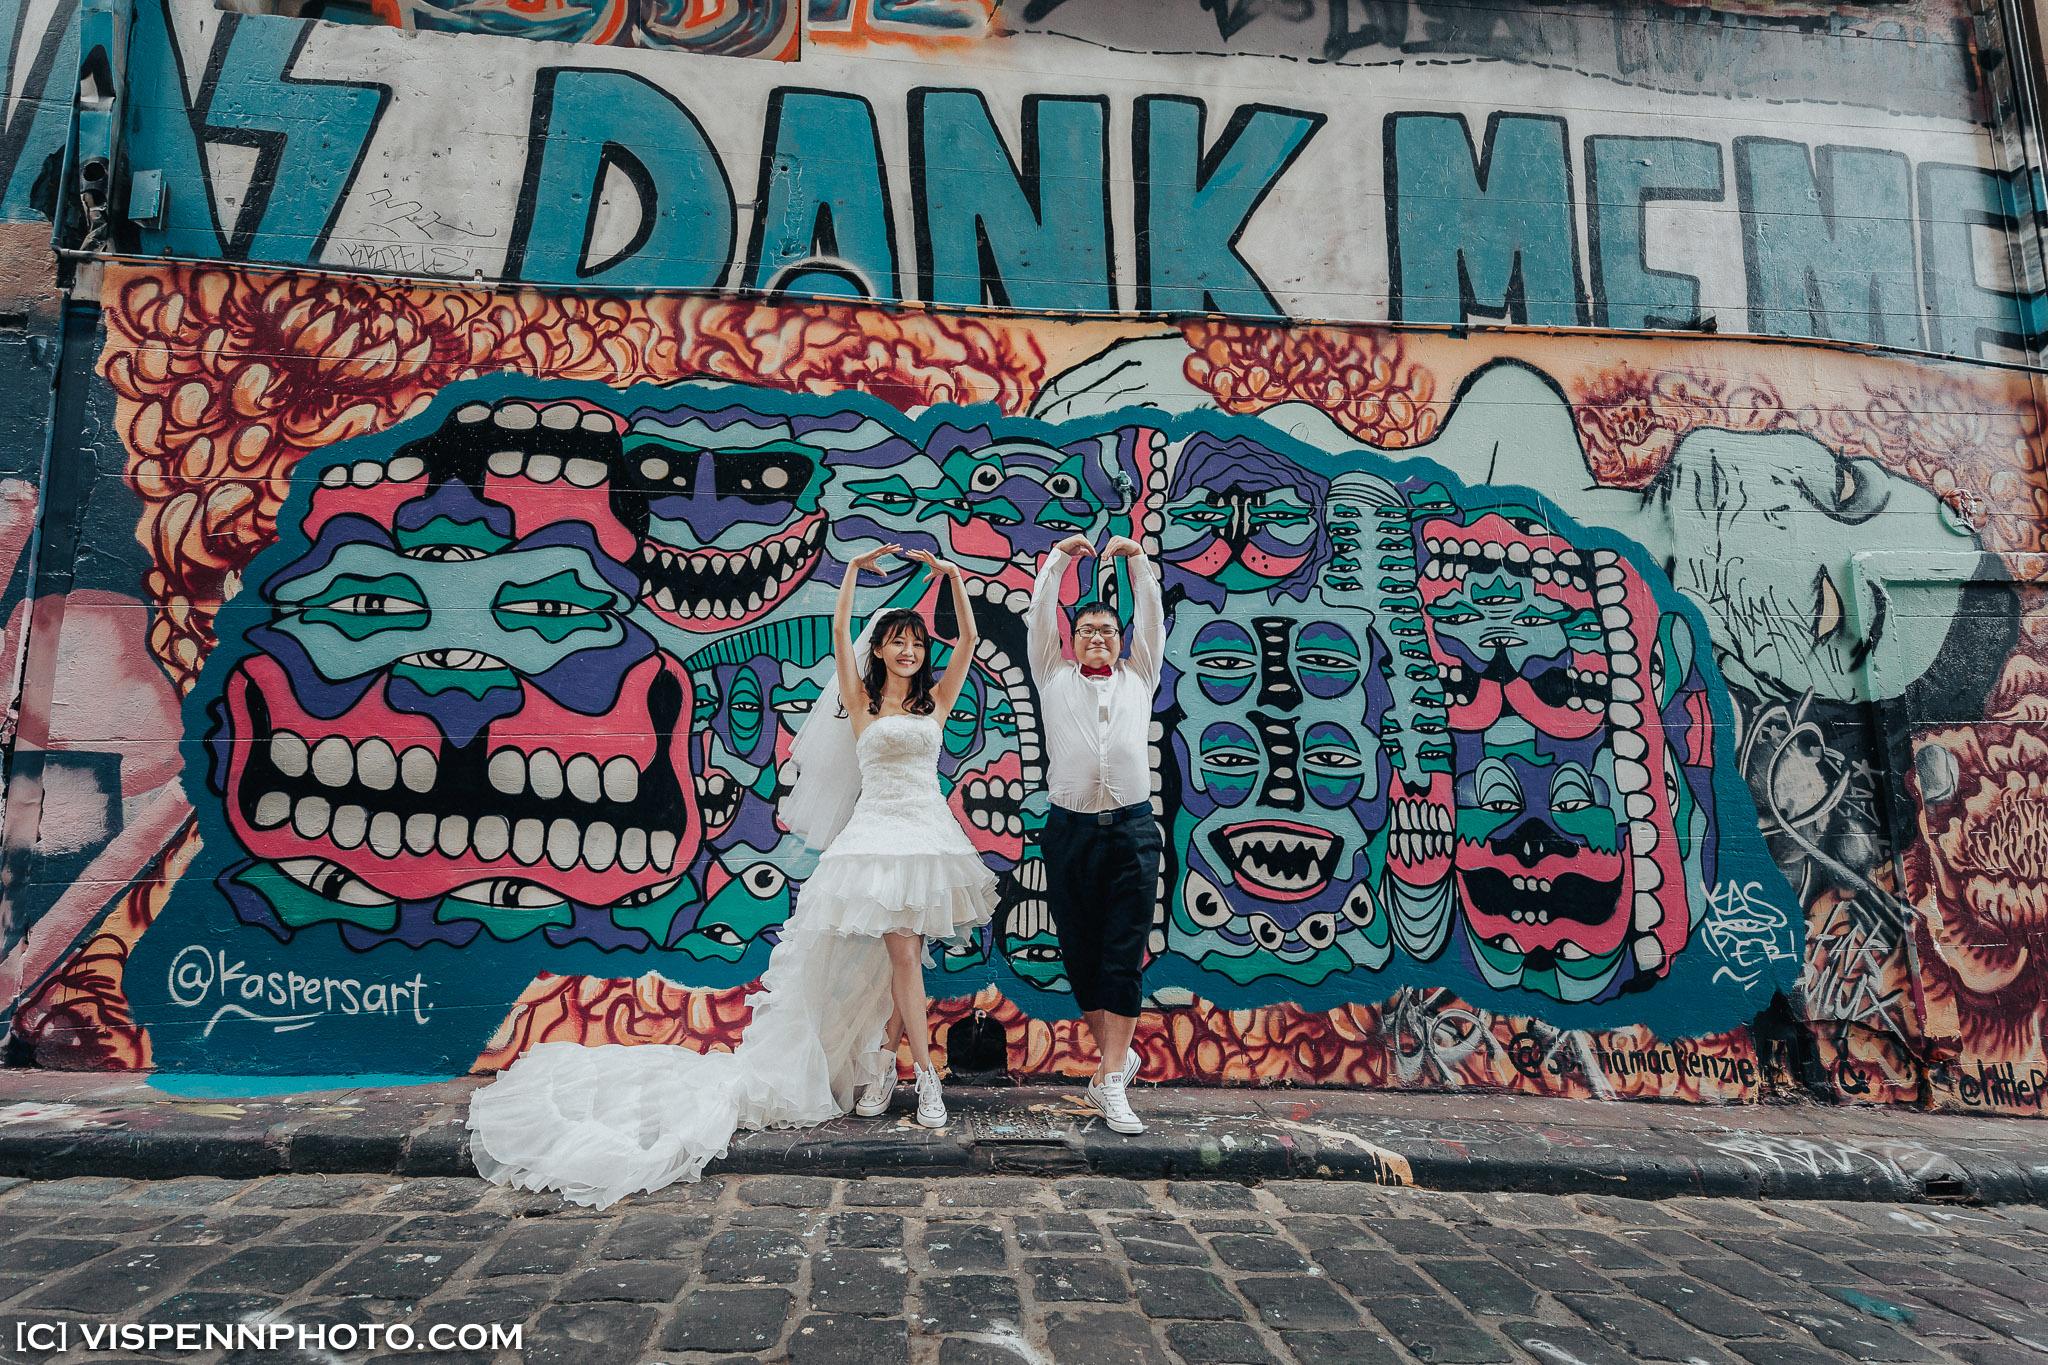 PRE WEDDING Photography Melbourne VISPENN 墨尔本 婚纱照 结婚照 婚纱摄影 VISPENN Olivia 2785